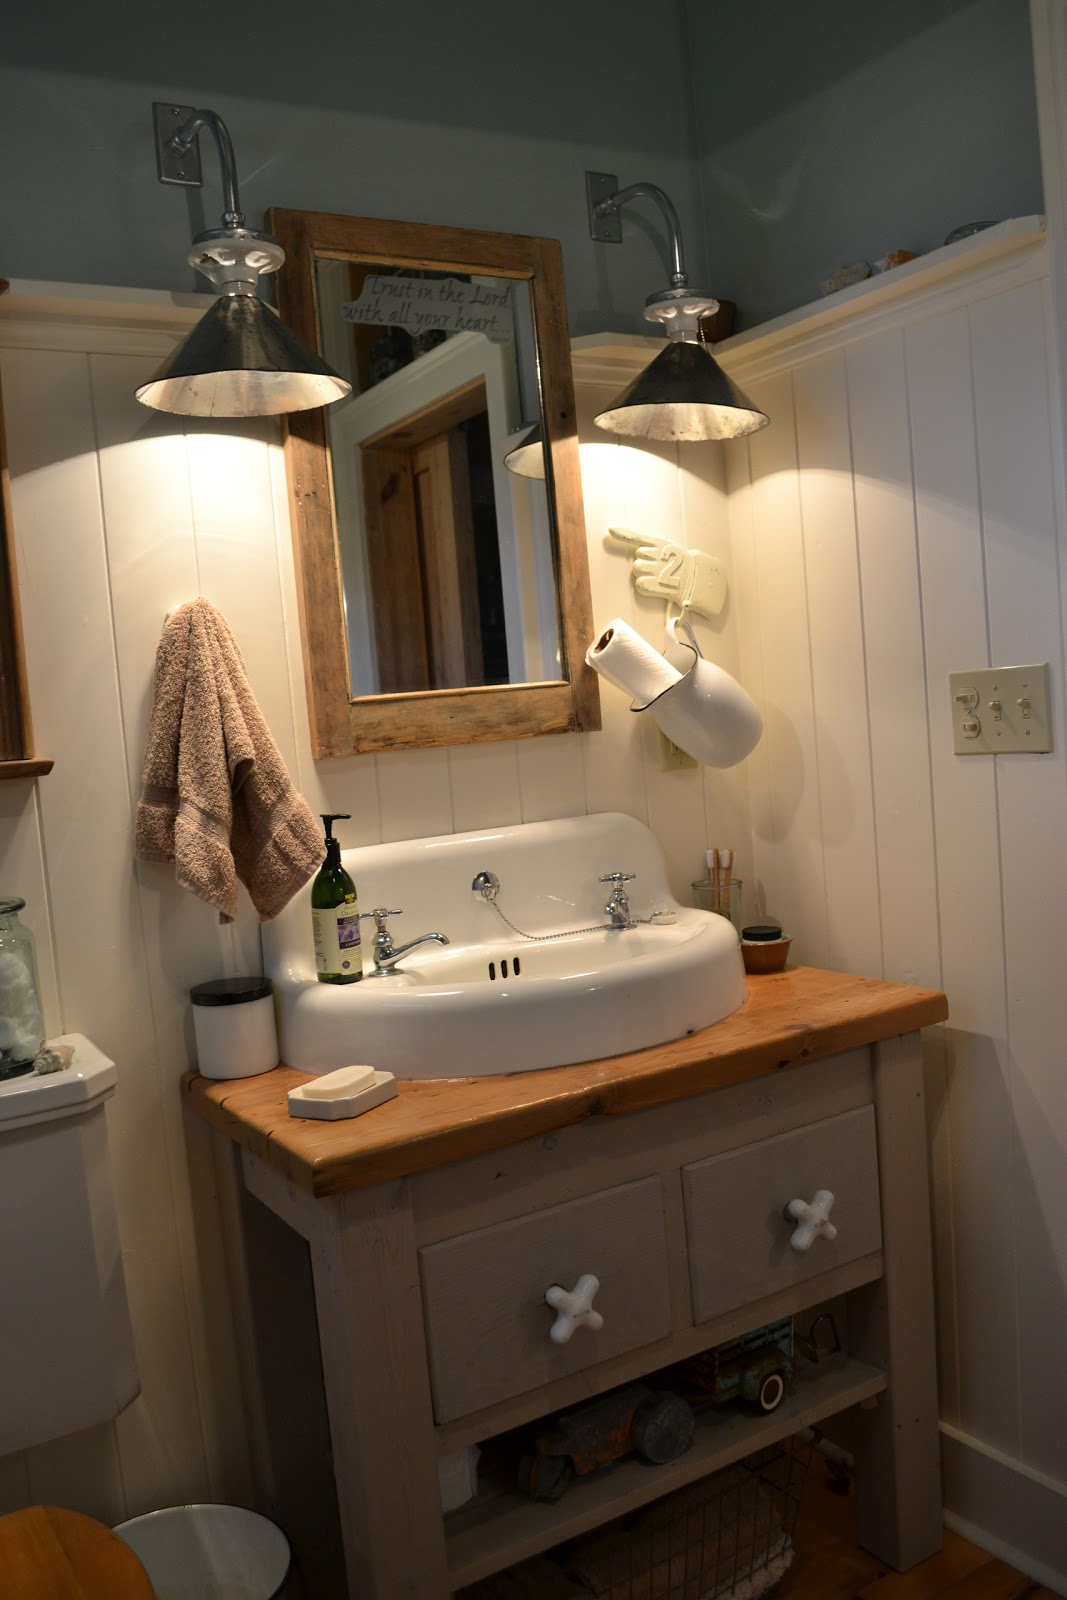 The 1829 Farmhouse farmhouse tour bathroom